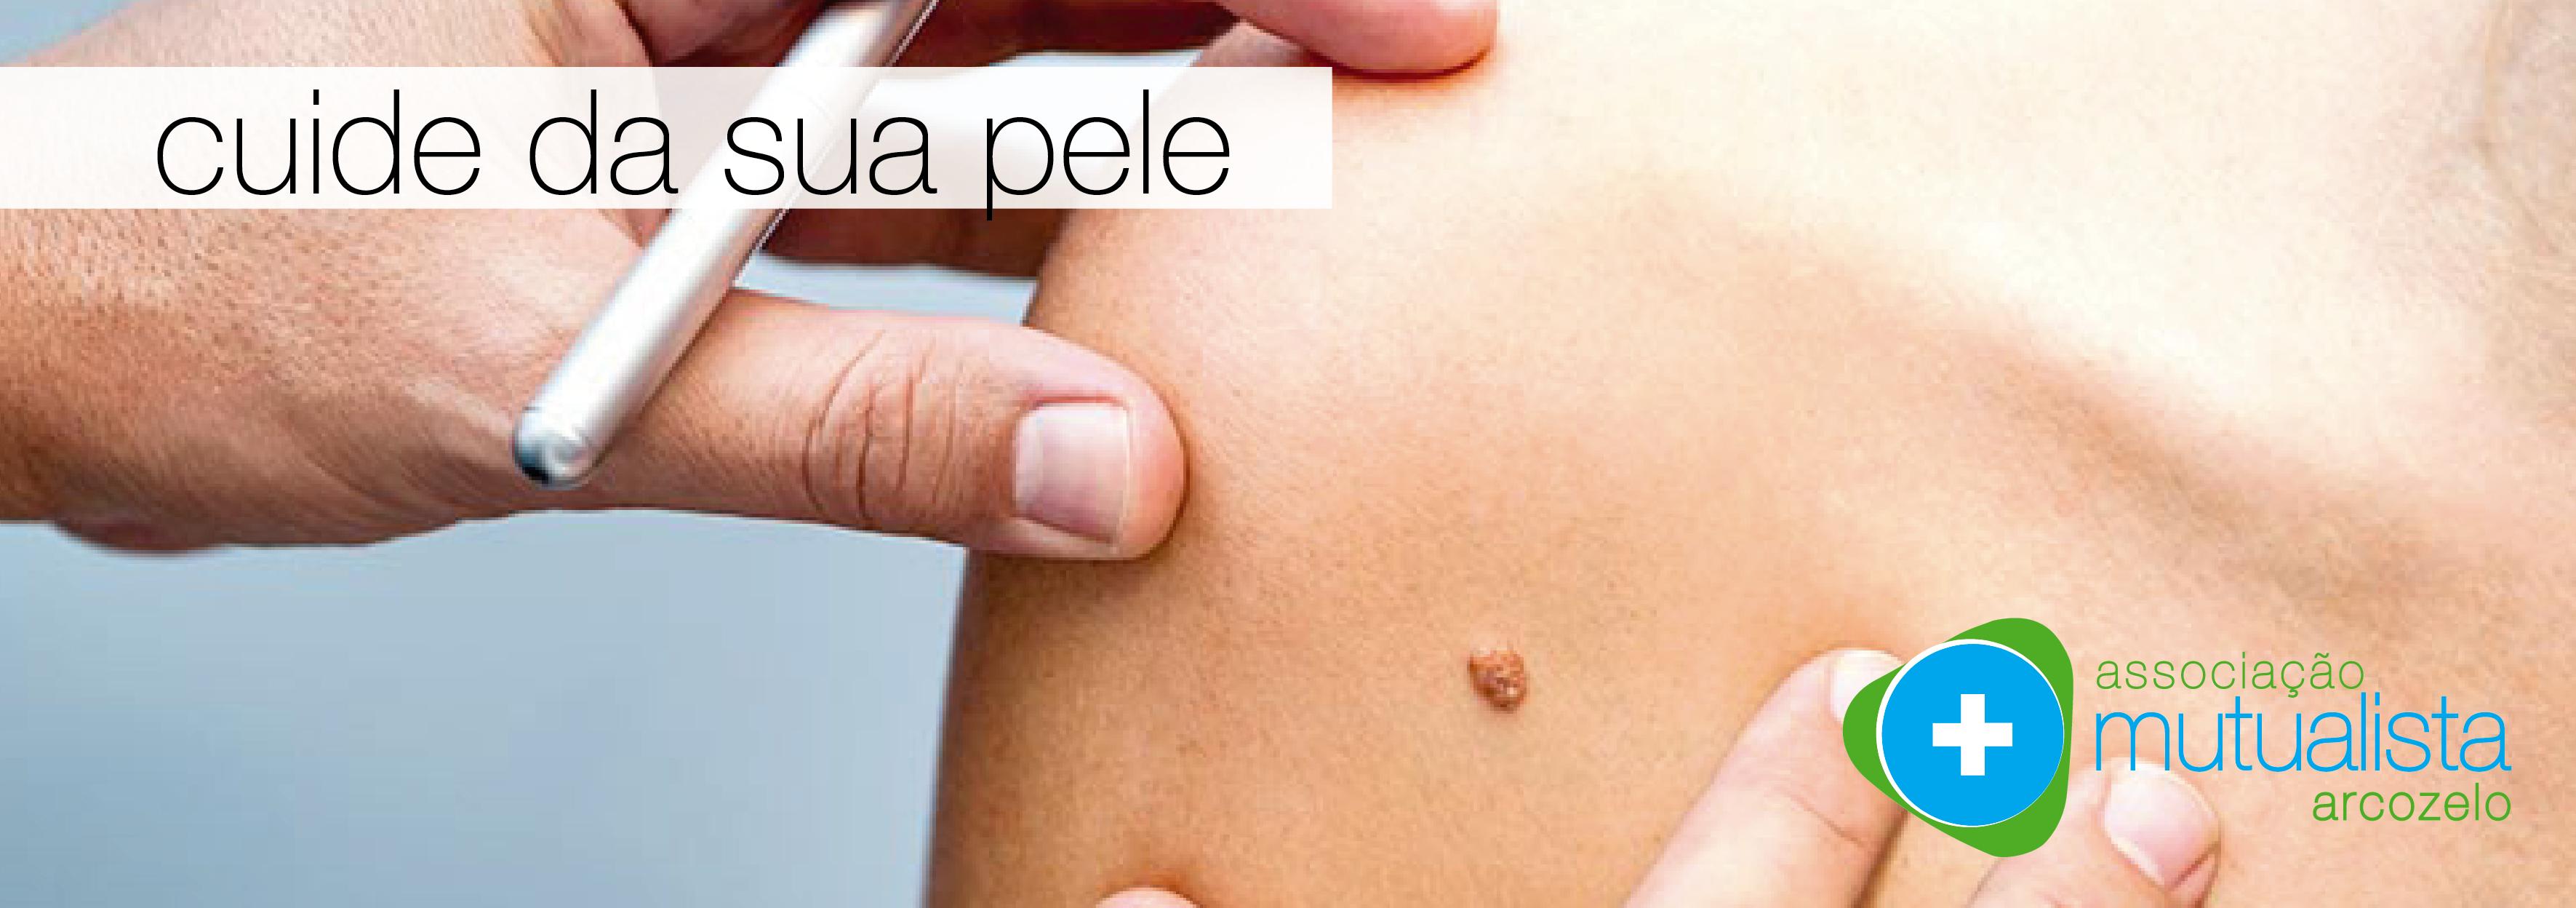 Img_dermatologia_website-35-34